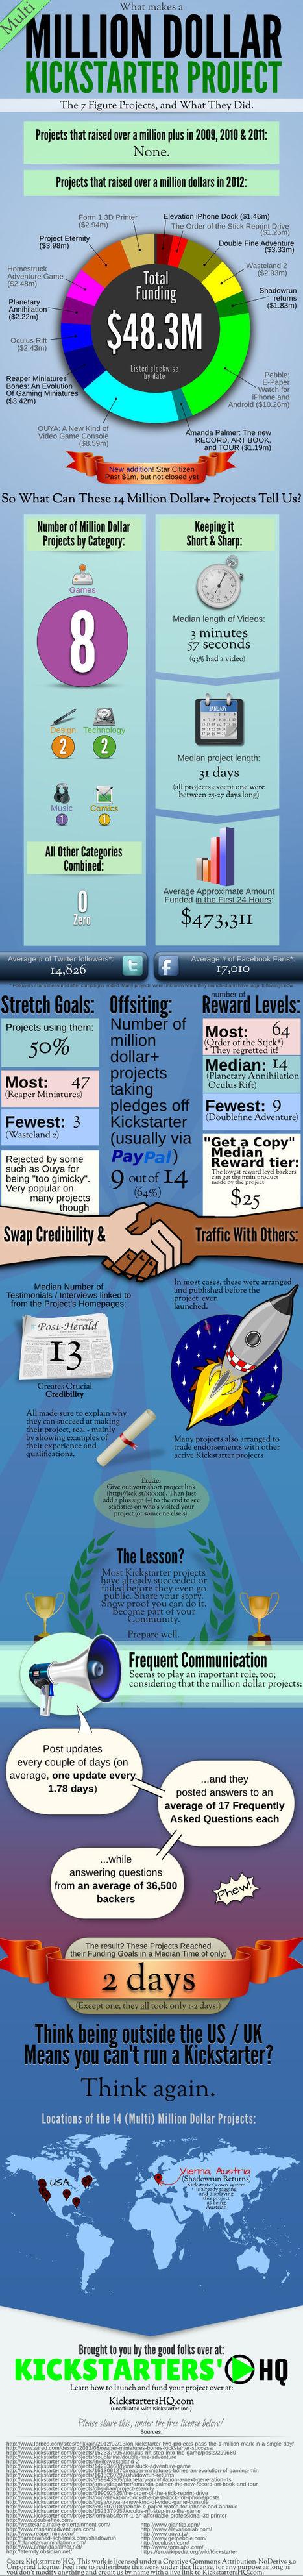 What Makes a (Multi-)Million Dollar Kickstarter Project? (Infographic) | Buzz on Bizz | Scoop.it